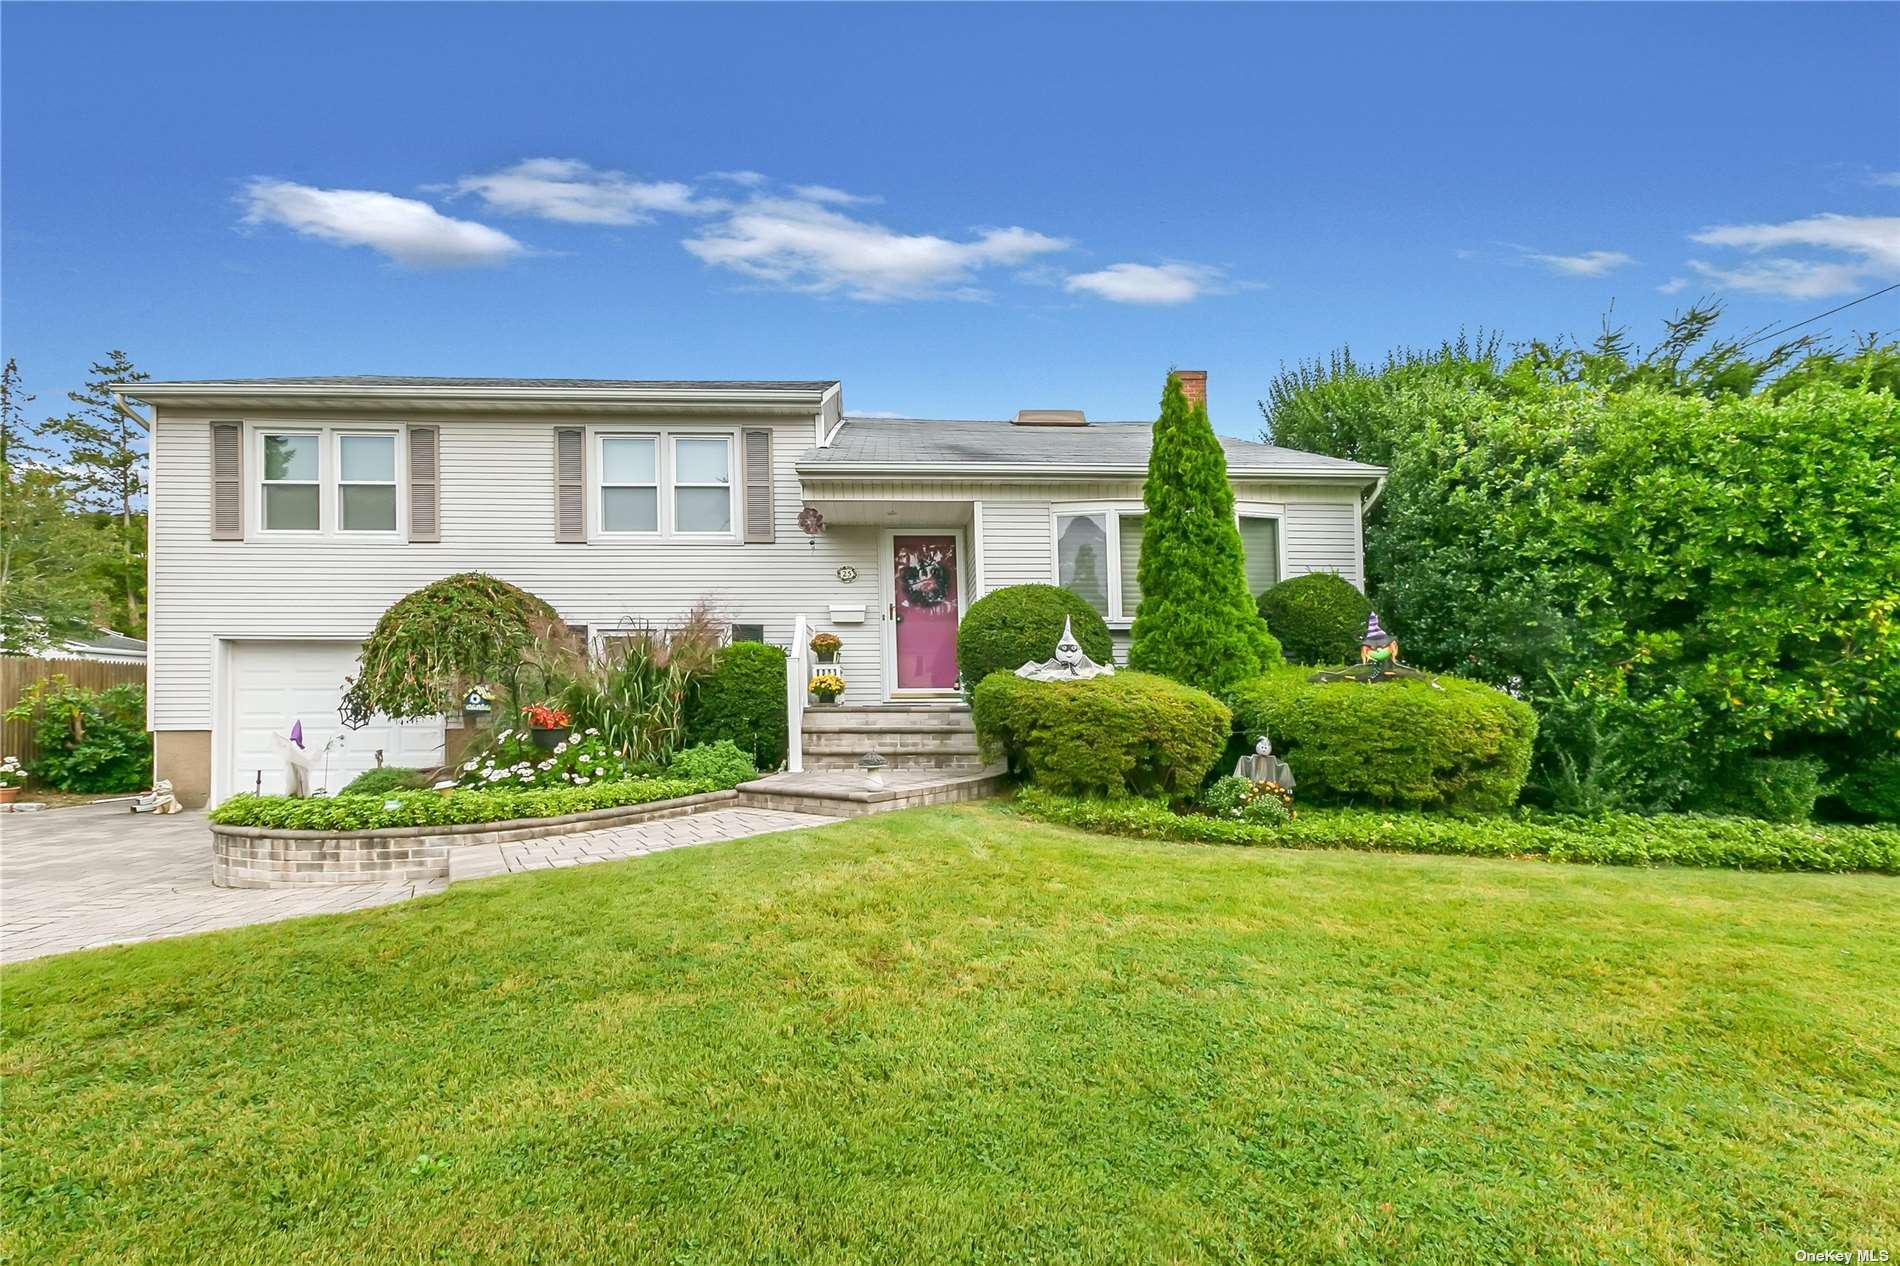 25 Pinetree Drive, Farmingdale, NY 11735 - MLS#: 3351406